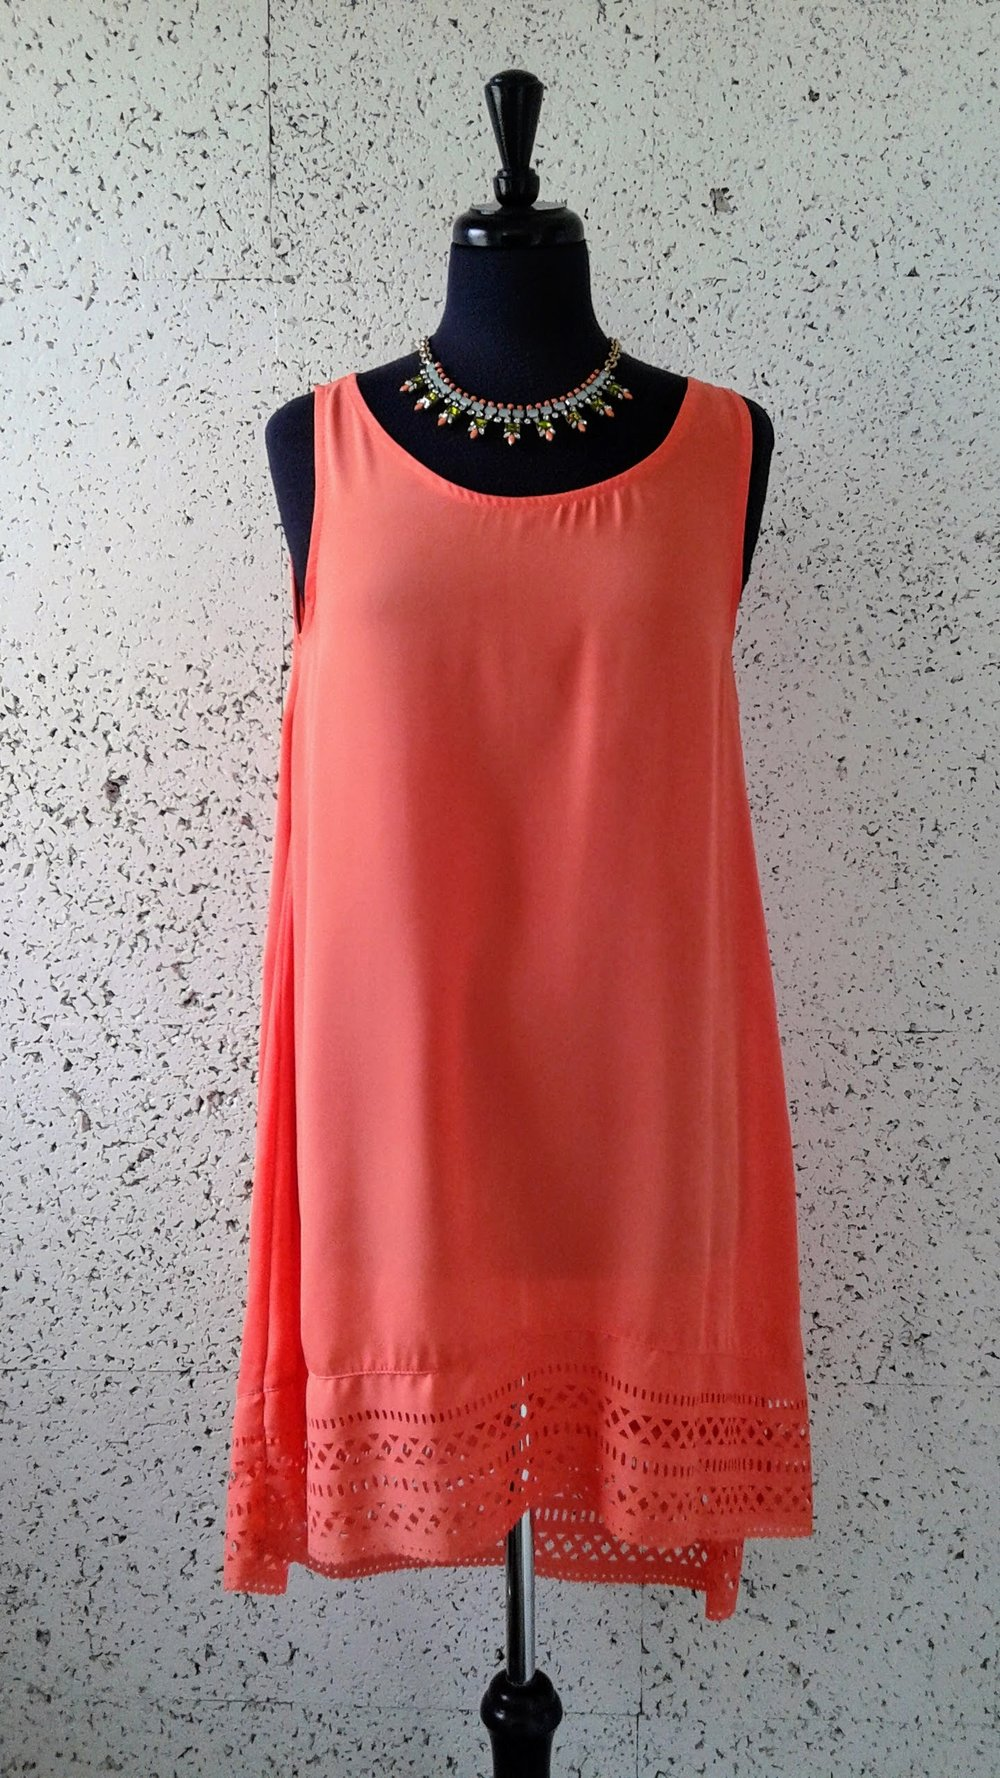 Oak+Fort dress; Size S, $48. J Crew necklace, $32